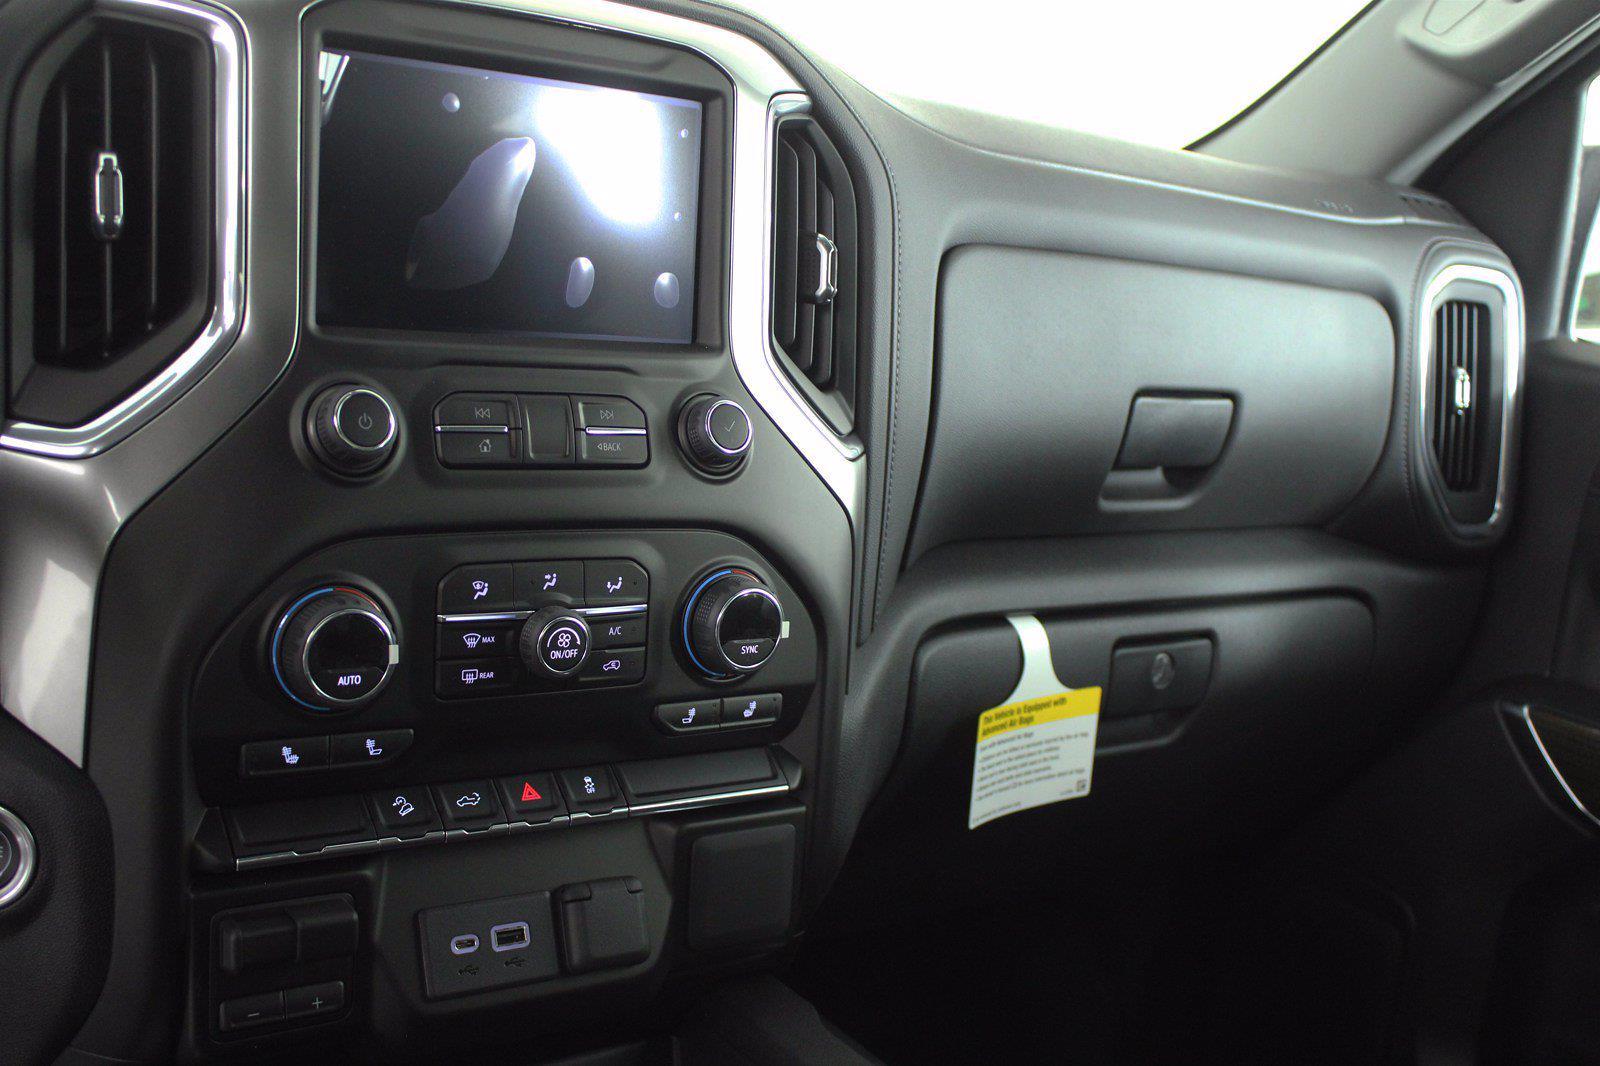 2021 Chevrolet Silverado 1500 Crew Cab 4x4, Pickup #D111110 - photo 12